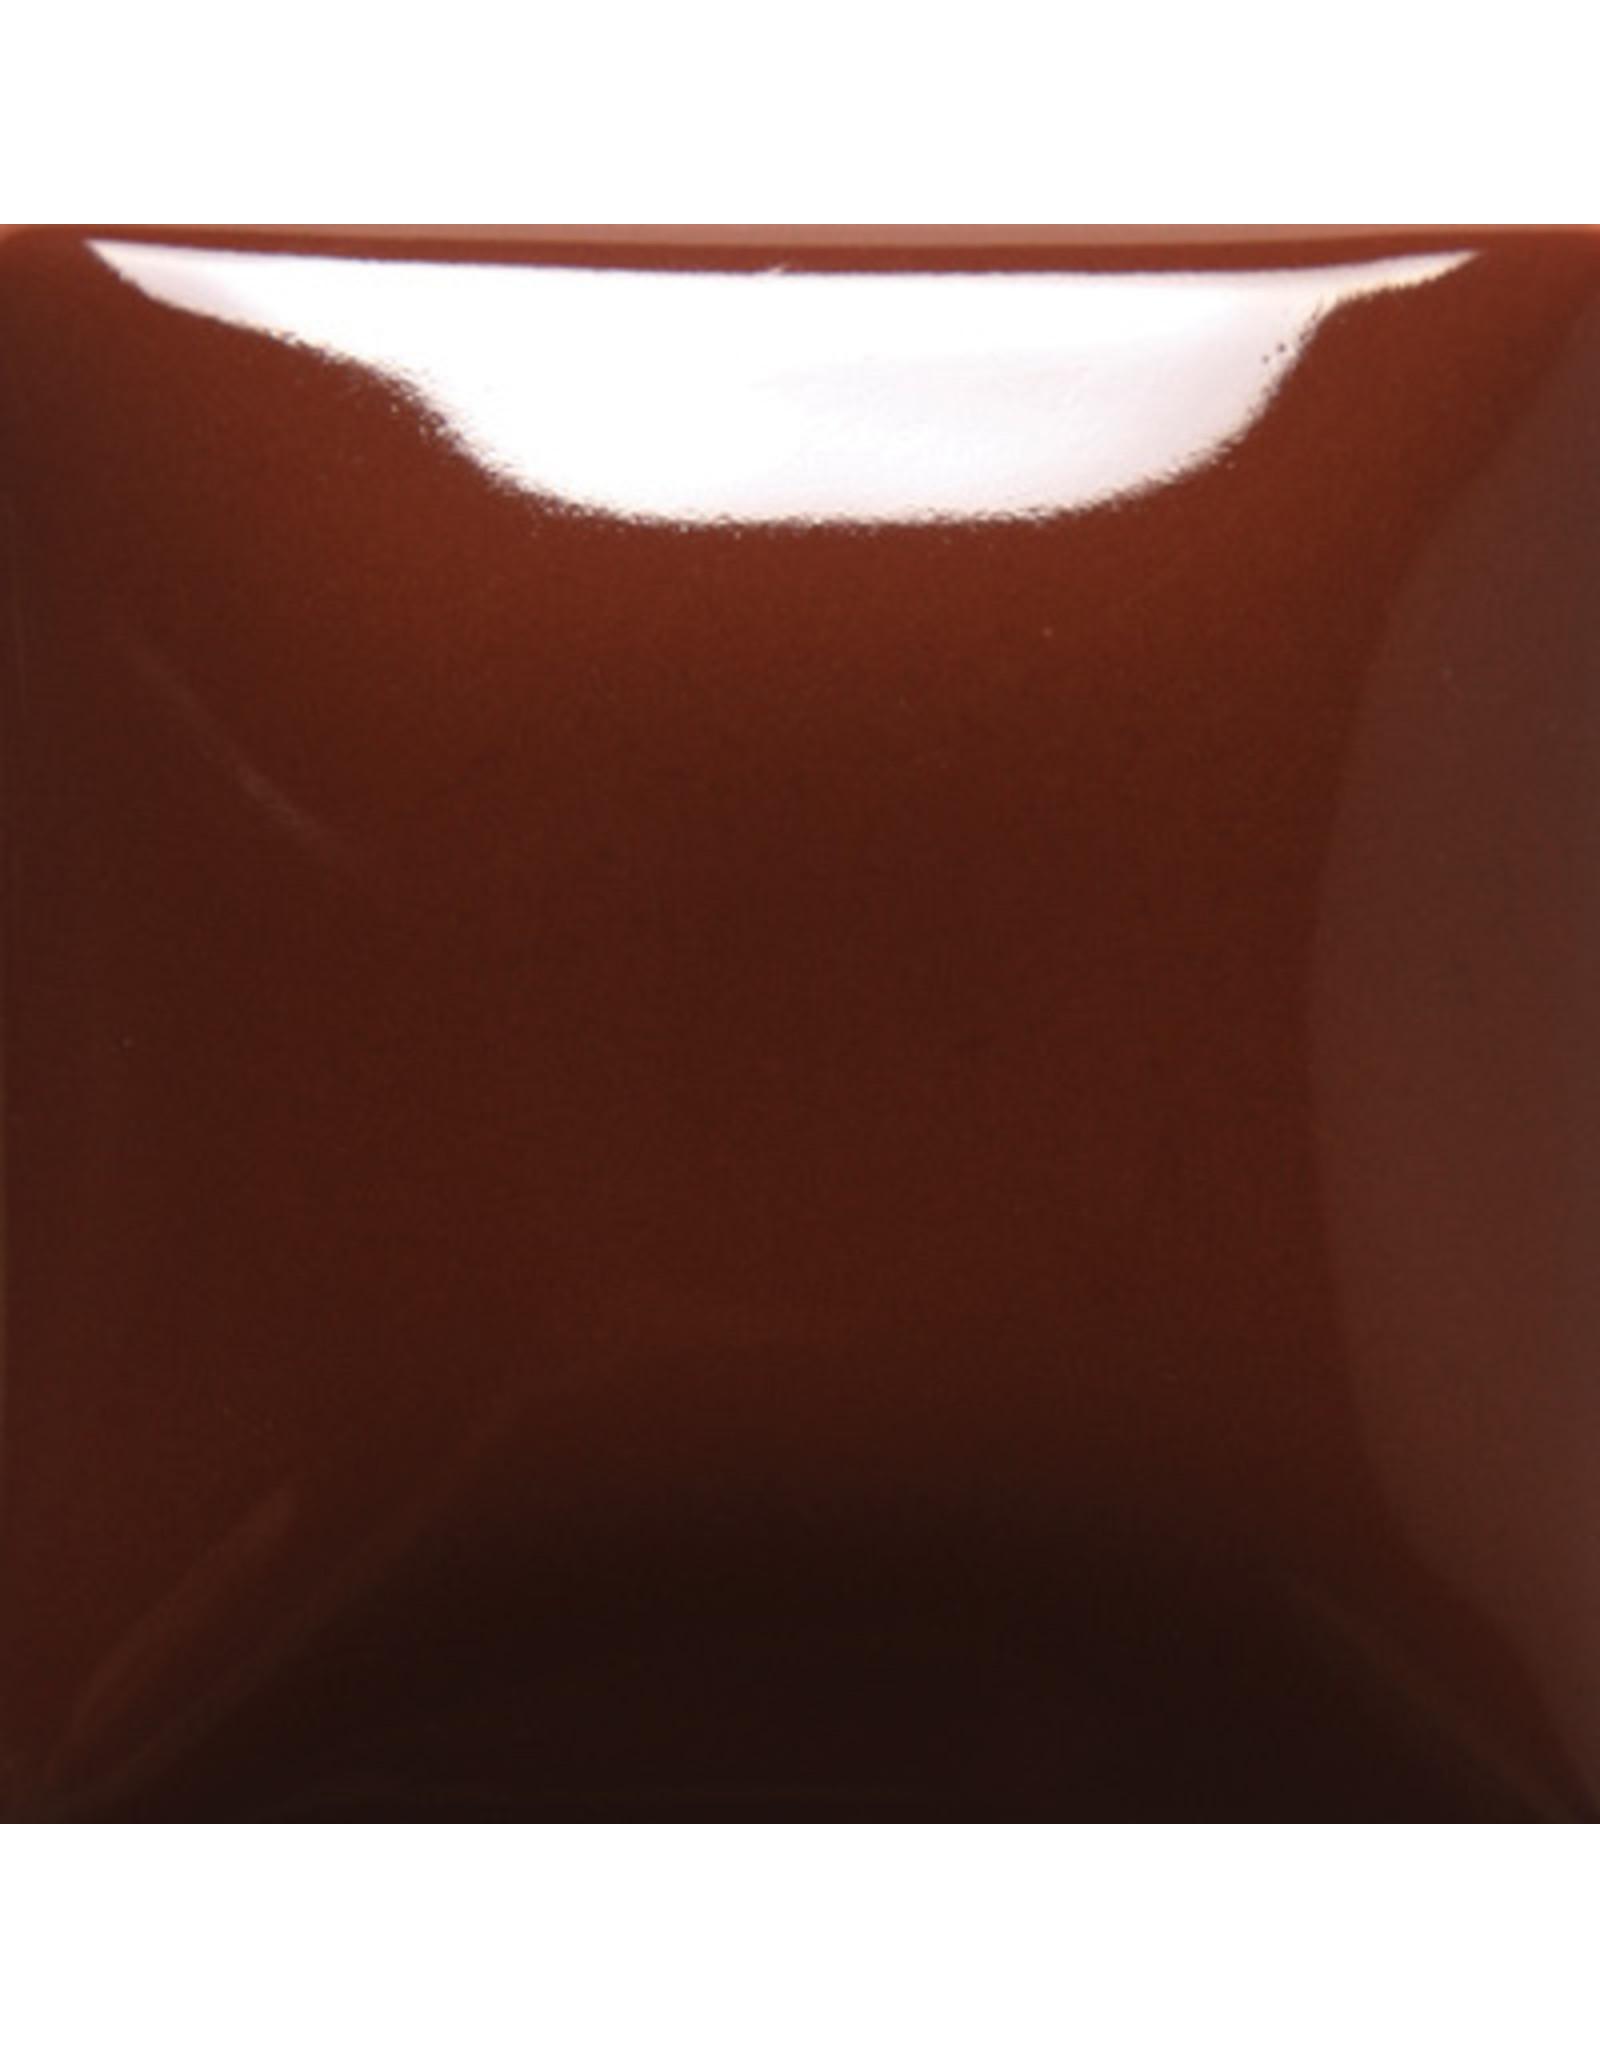 Mayco Mayco Foundations Rich Chocolate 118ml